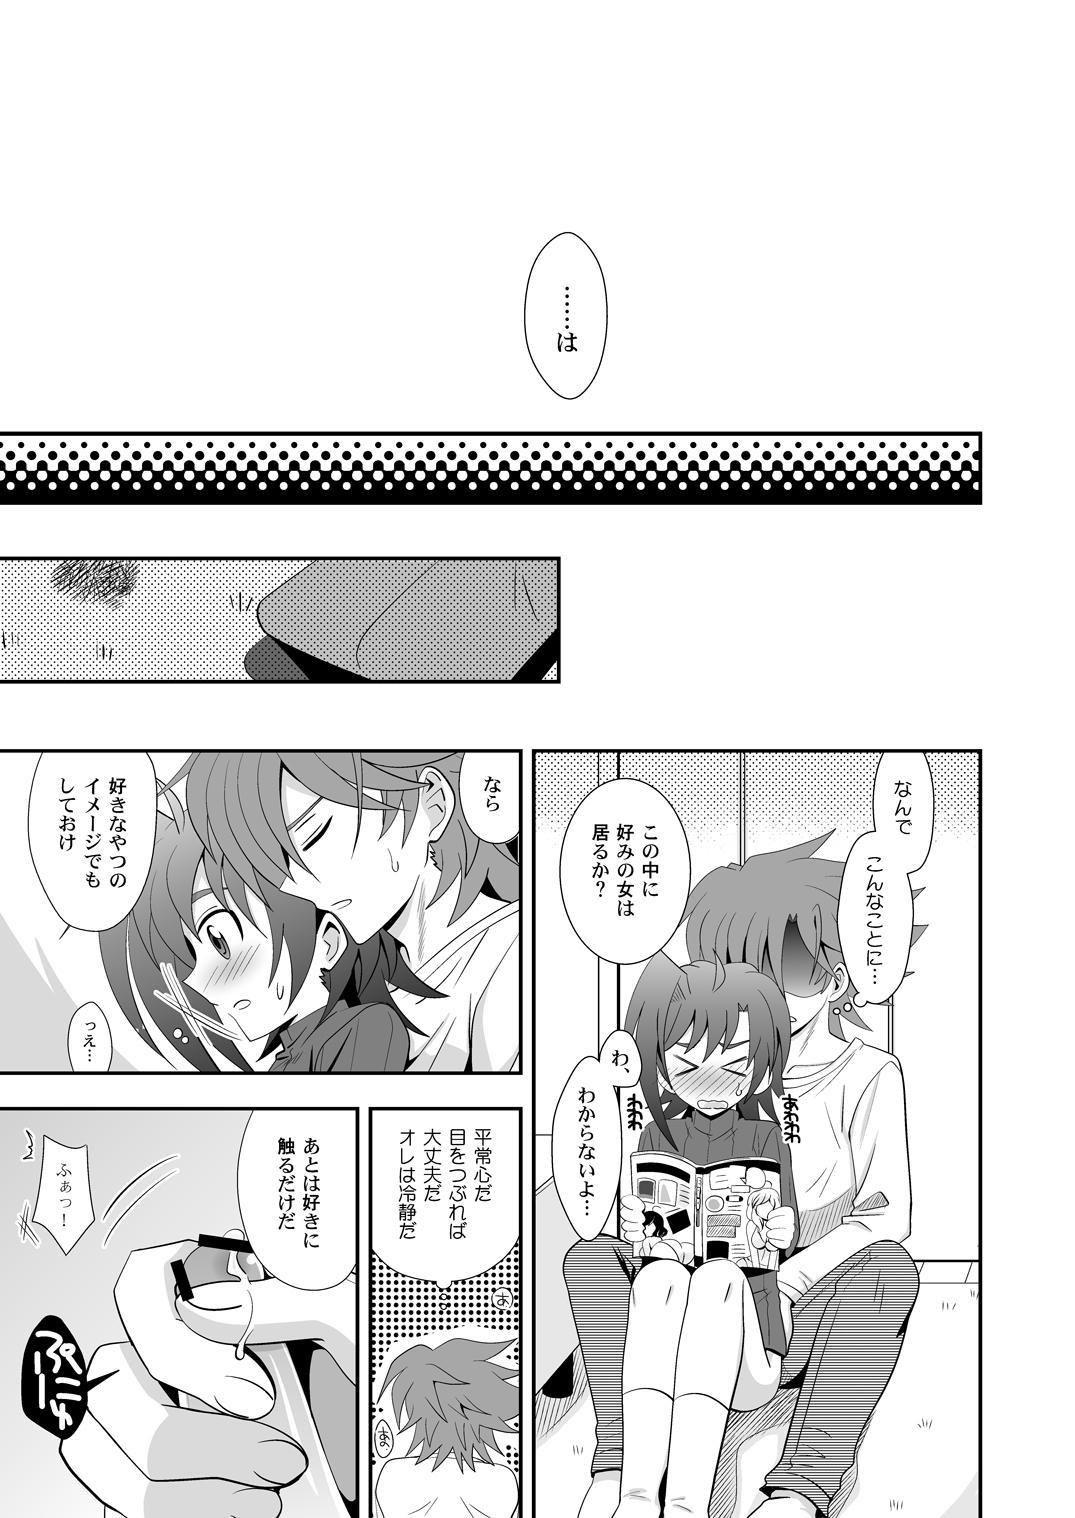 Toshiki mada 1○ dakara 7